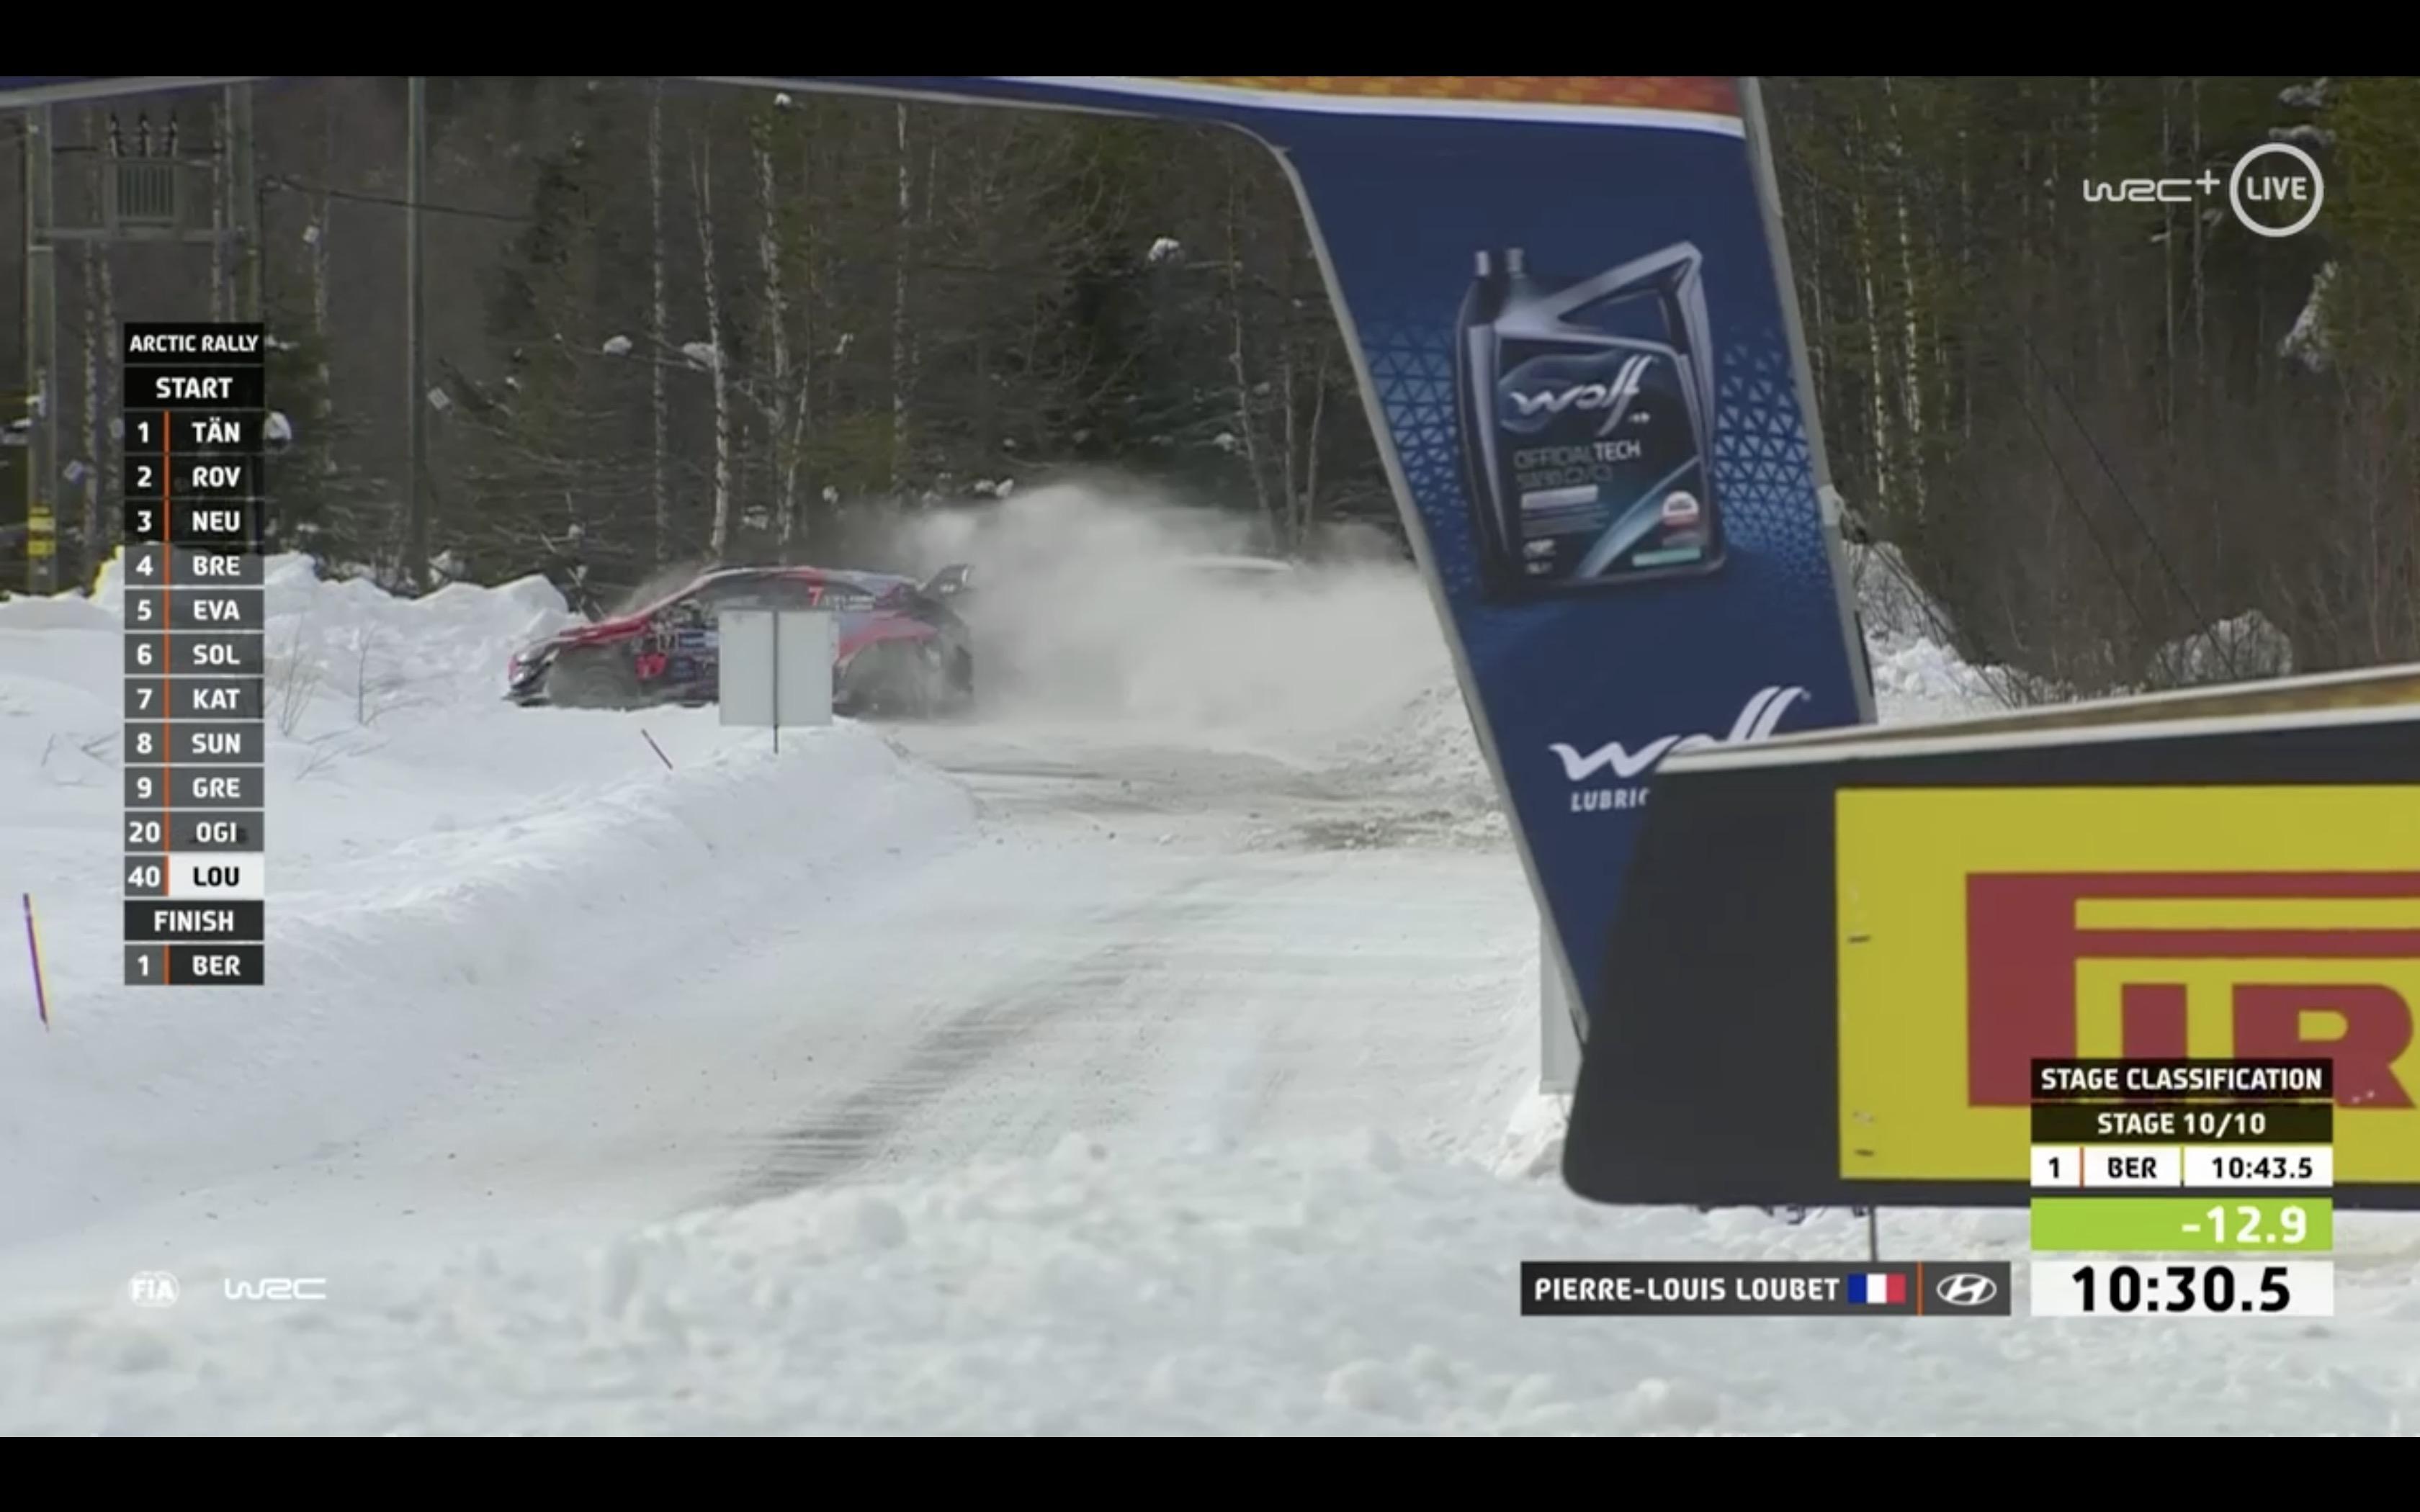 WRC: Arctic Rally Finland - Powered by CapitalBox [26-28 Febrero] - Página 7 EvT3UxOWQAQakyF?format=jpg&name=4096x4096